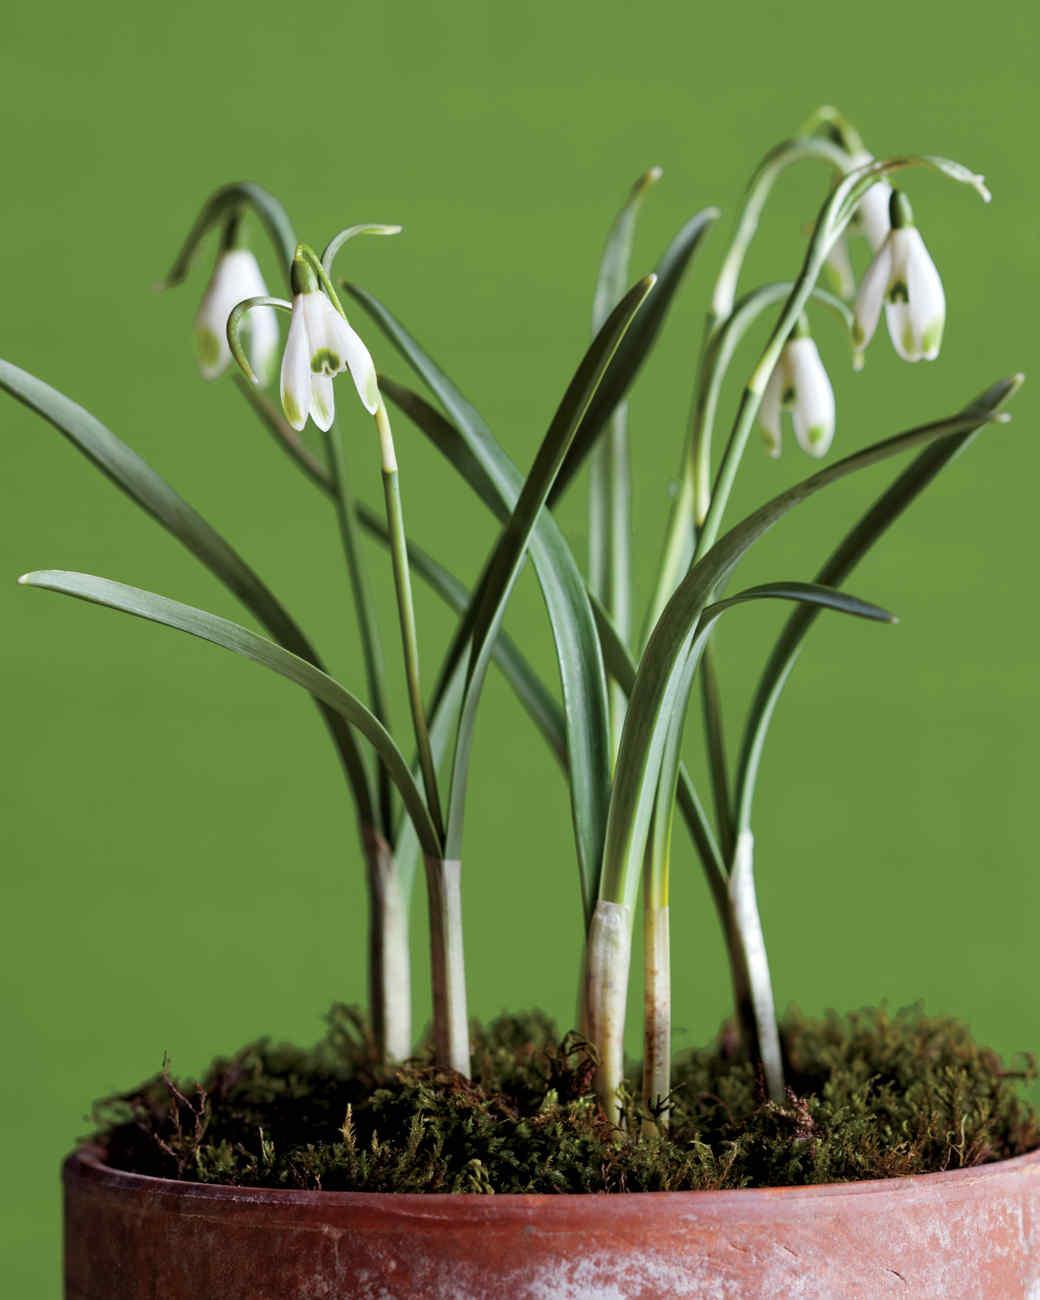 snowdrops-green-tipped-mld107313.jpg